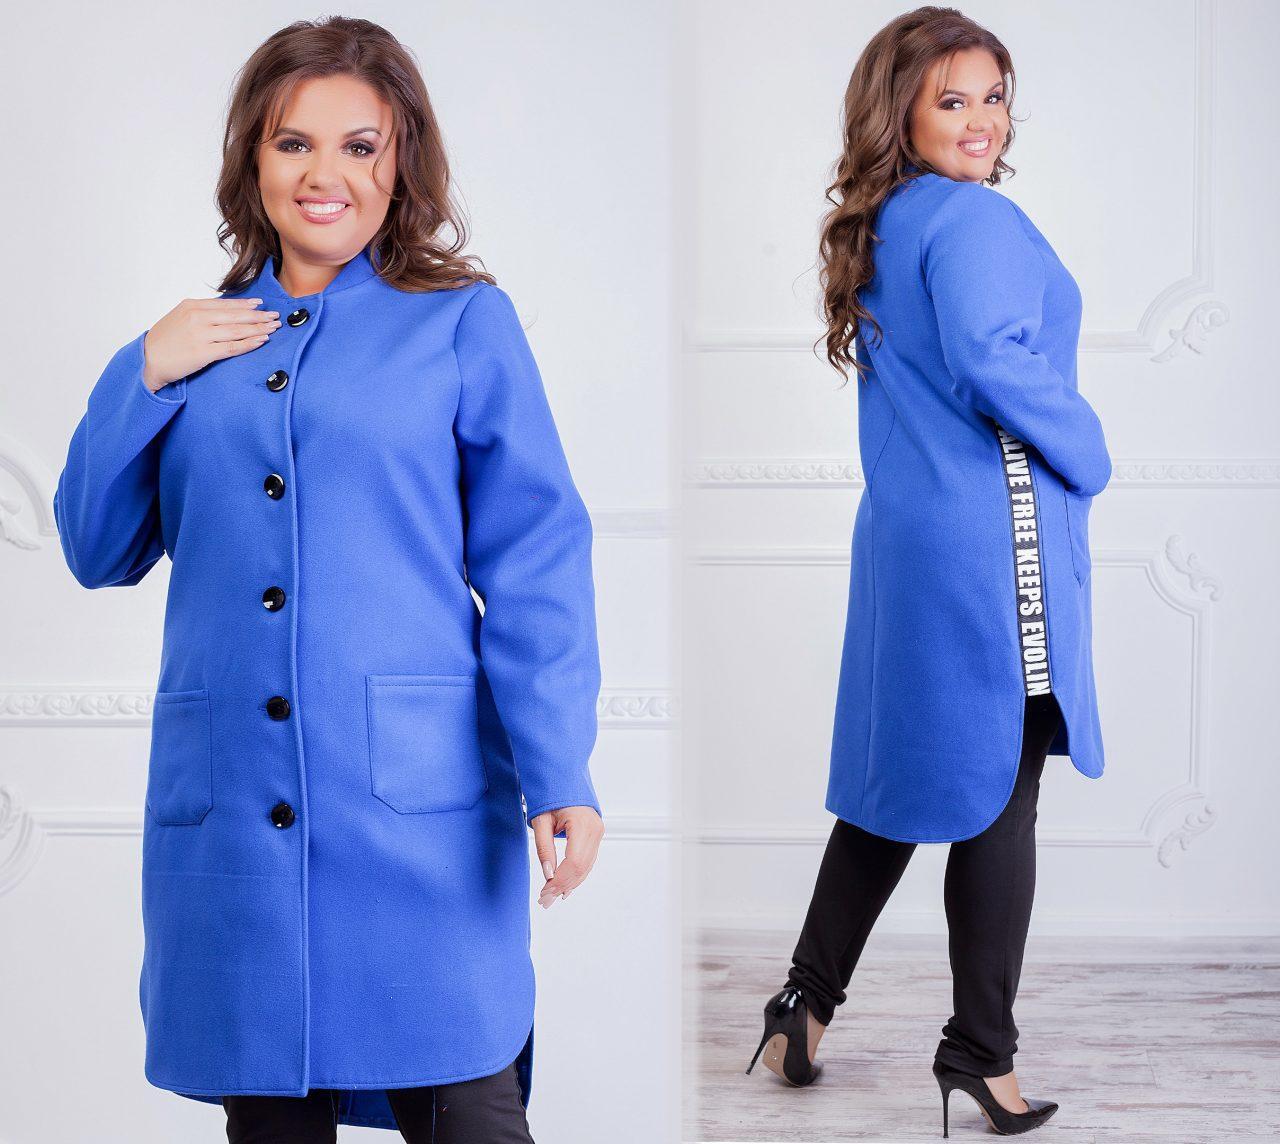 Кашемировое пальто-кардиган электрик 8271